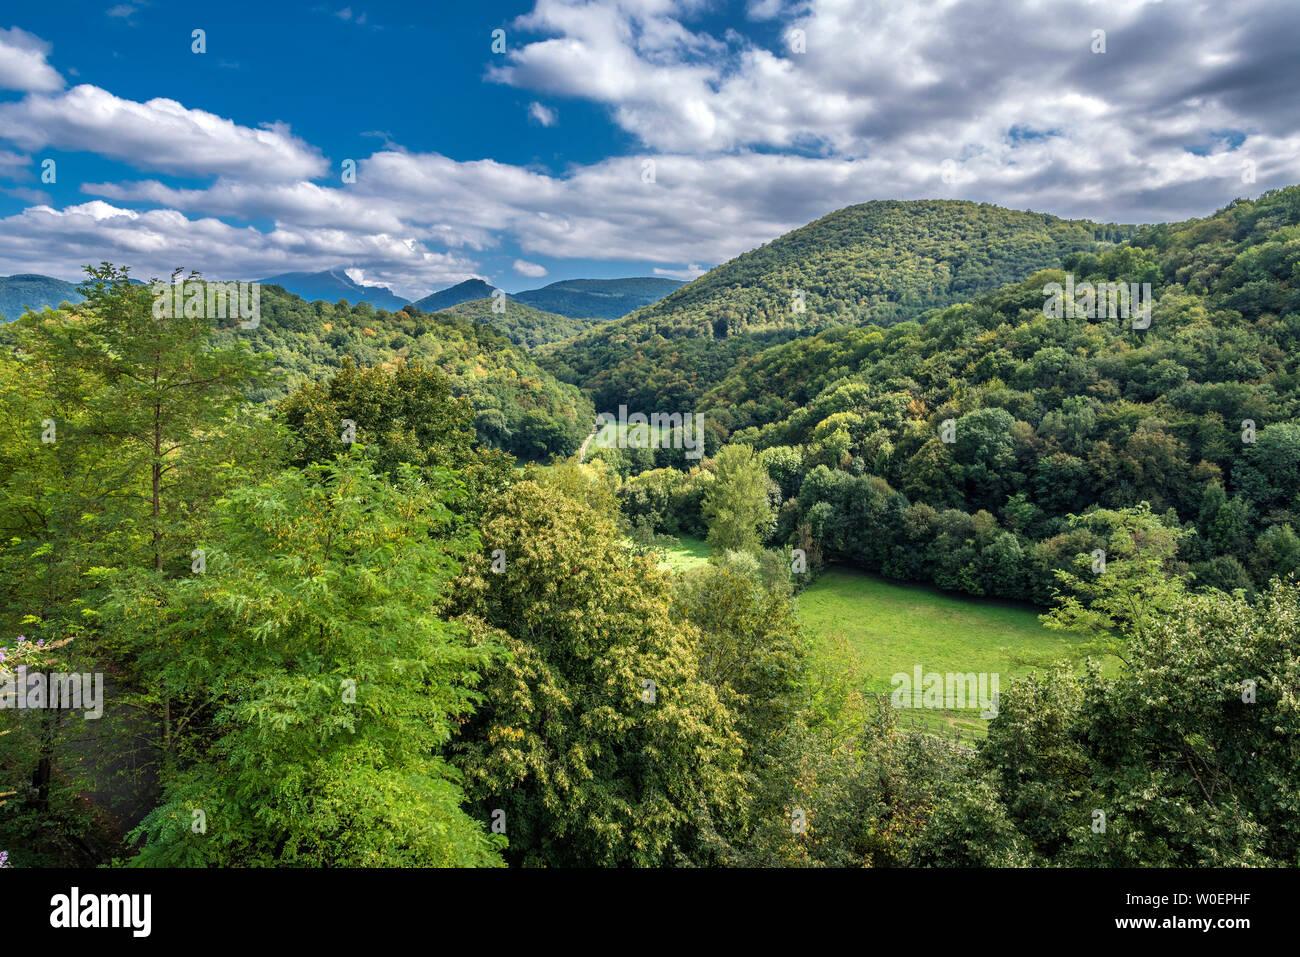 France, Piedmont of the Pyrenees, Haute Garonne, Saint Bertrand de Comminges, (Most Beautiful Village in France) Saint James way, (UNESCO World Heritage) - Stock Image